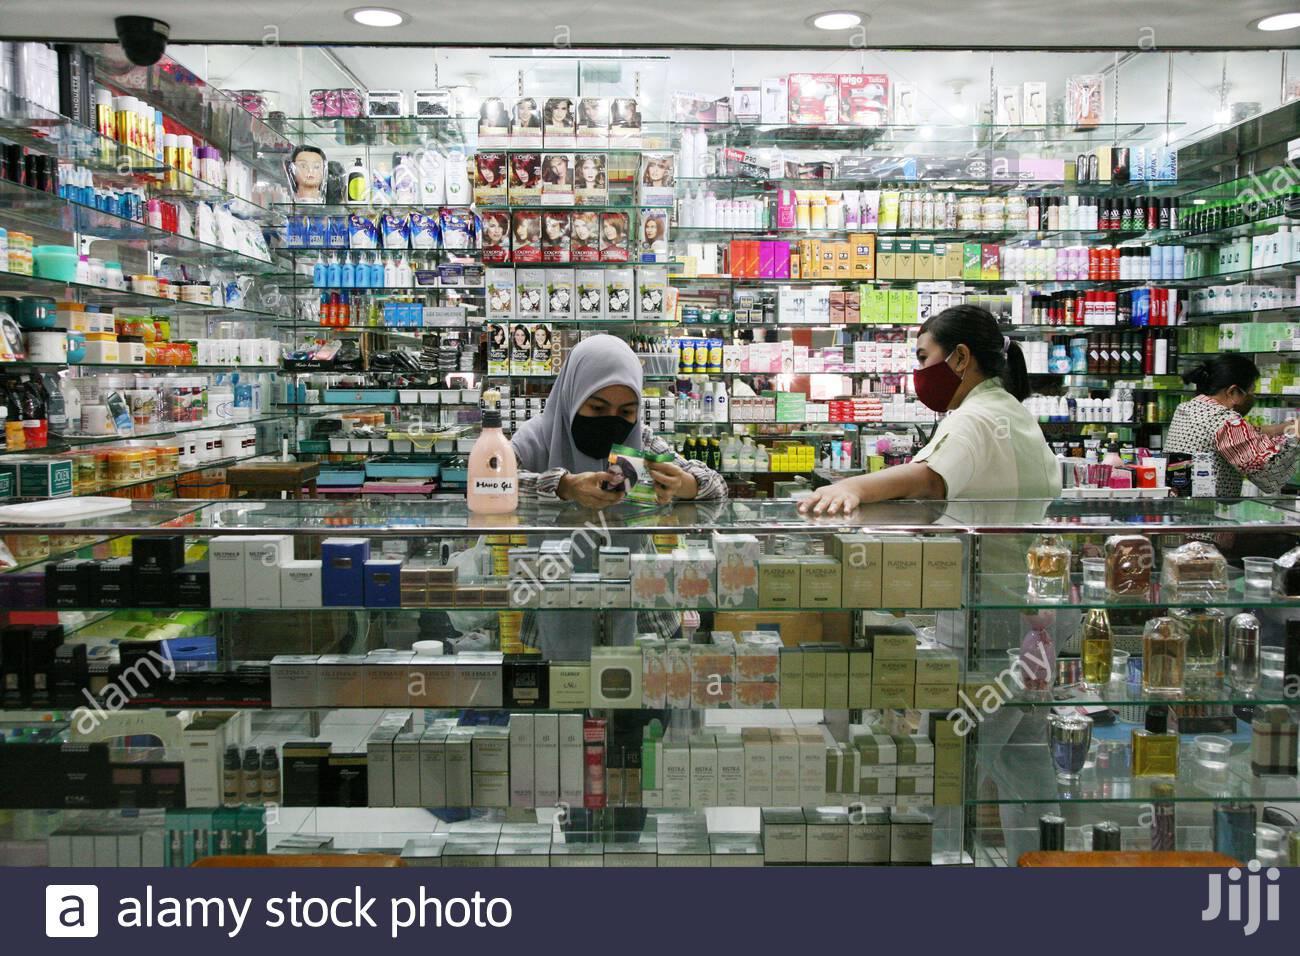 Mall/Supermarket Attendants Needed Urgently